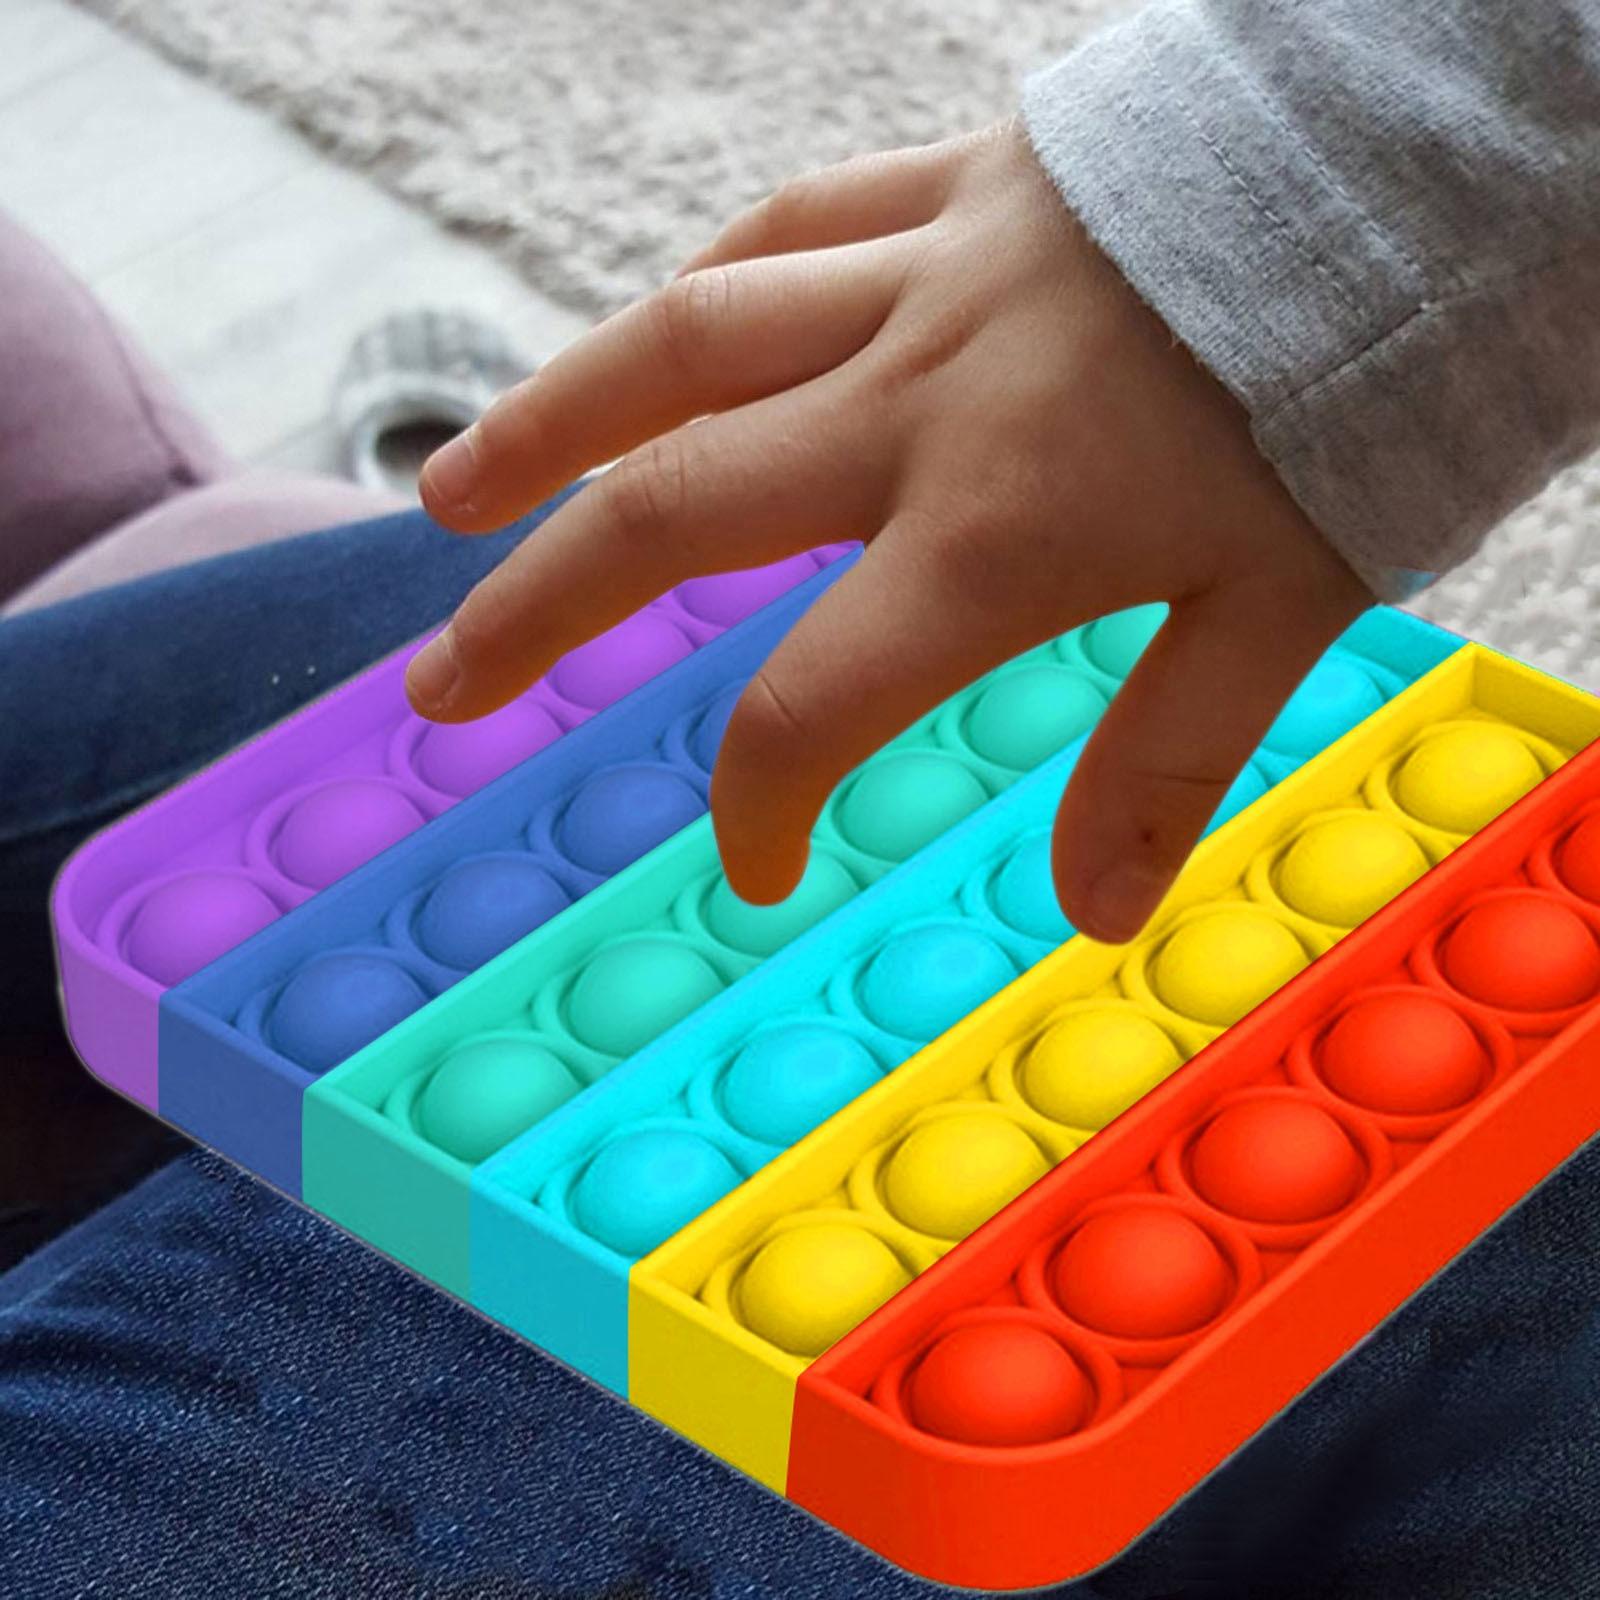 Stress Reliever Toys Bubble-Sensory-Toy Autism Needs Pops-It-Fidget Squishy Push-Pops img2